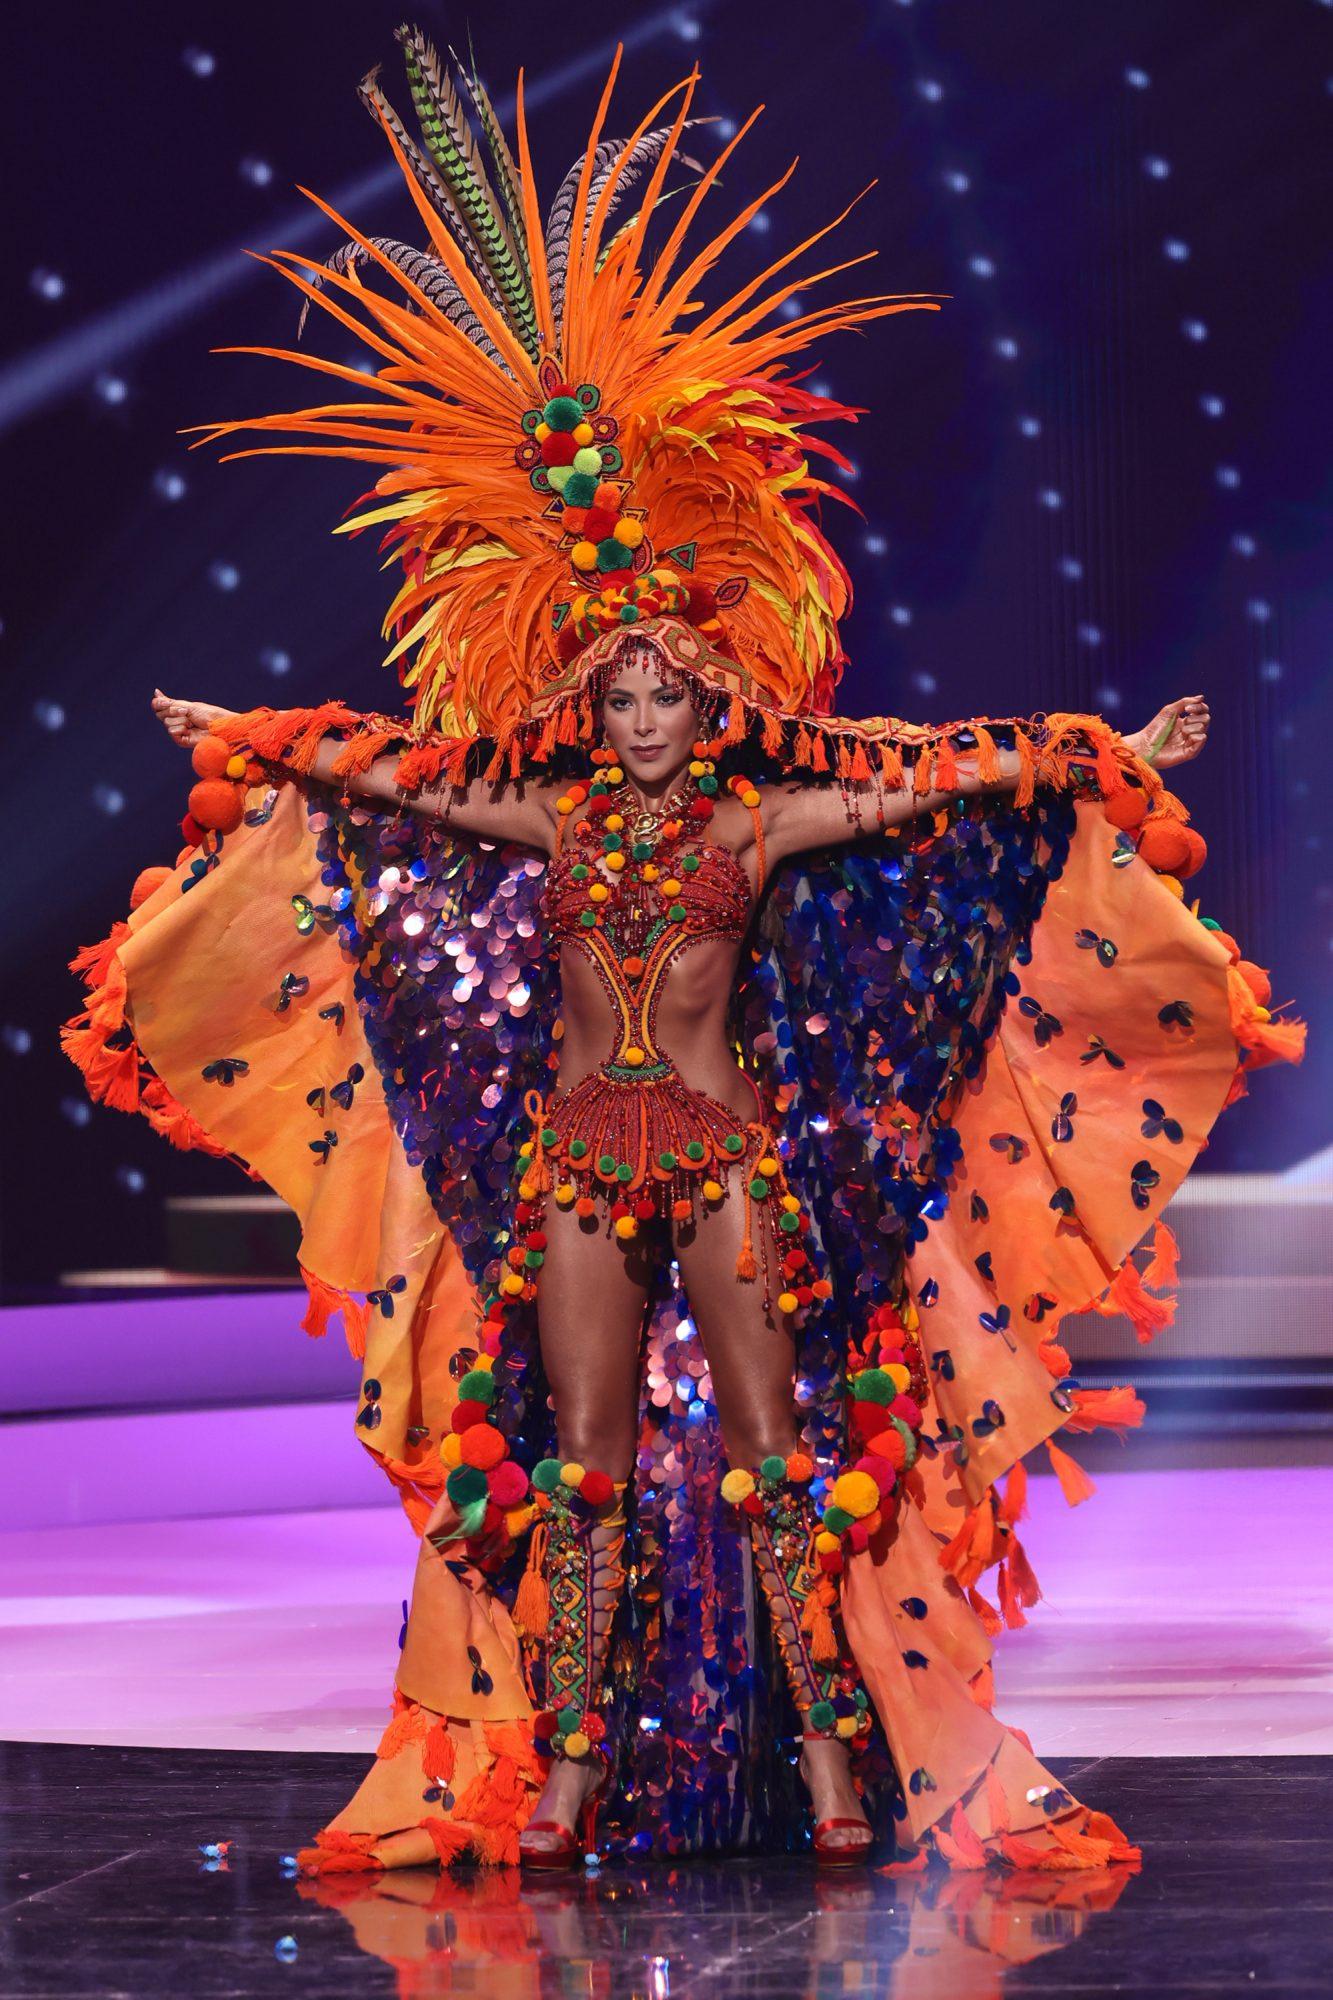 Trajes típicos latinas Miss Universo